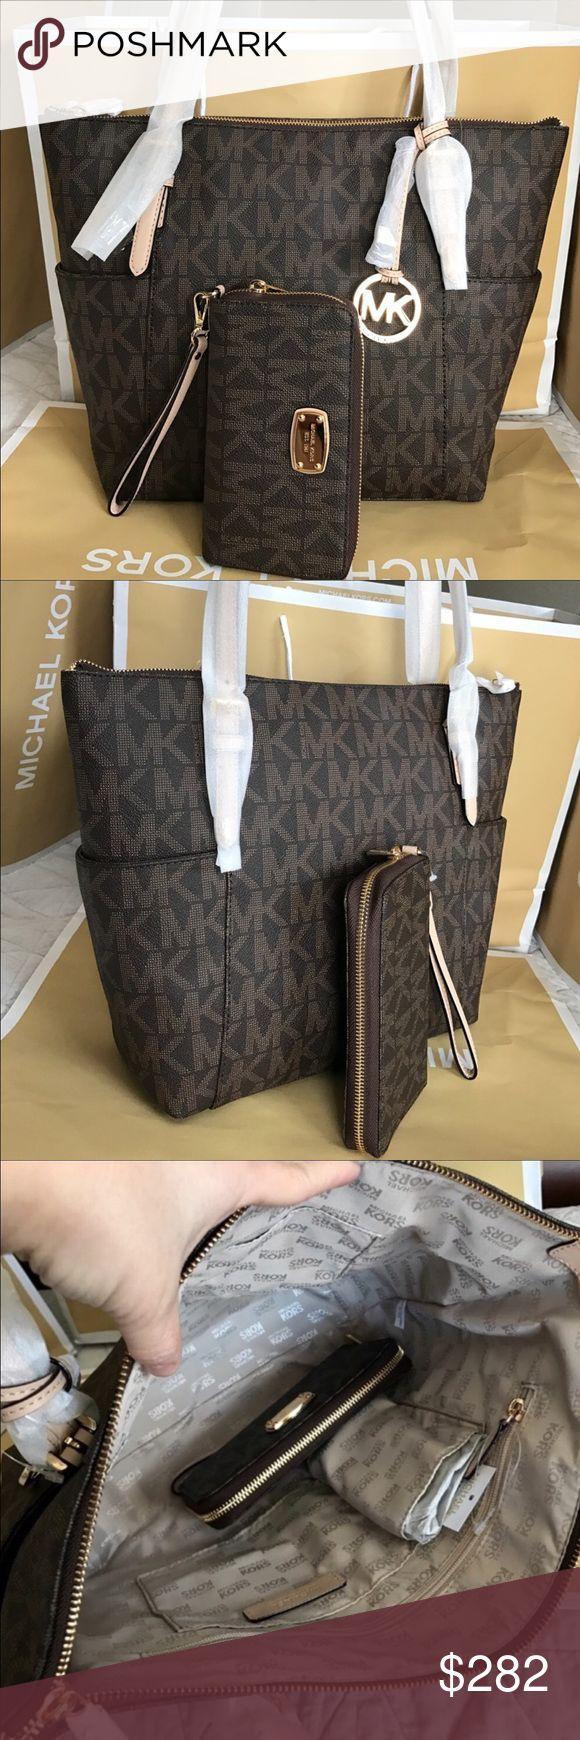 Michael Kors Set 100% Authentic Michael Kors Tote Bag and Wallet, both brand new!.color Brown. Michael Kors Bags Totes